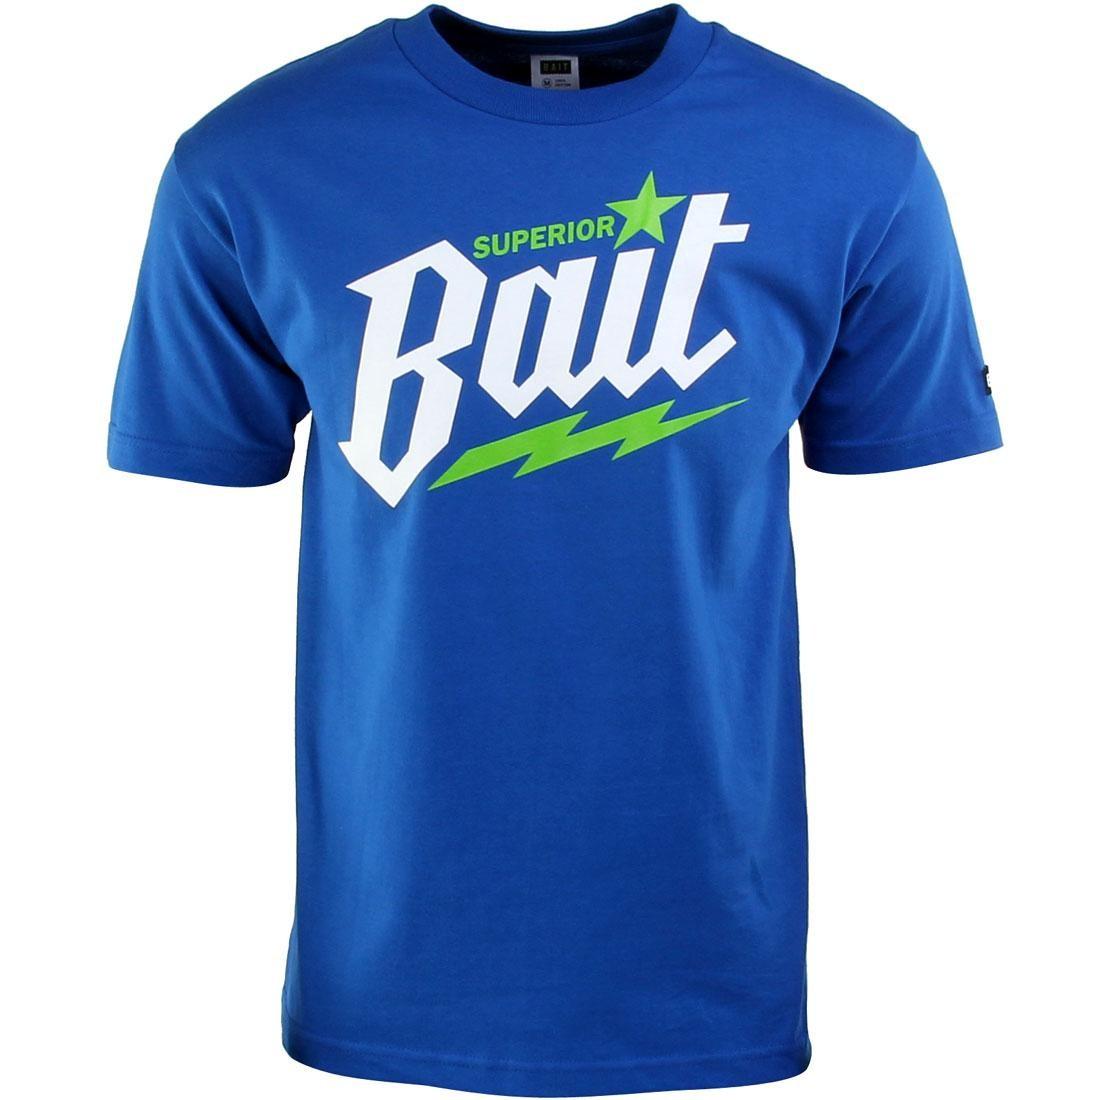 Tシャツ 青 ブルー 白 ホワイト 【 BLUE WHITE BAIT SUPERIOR TEE ROYAL GREEN 】 メンズファッション トップス カットソー 送料無料